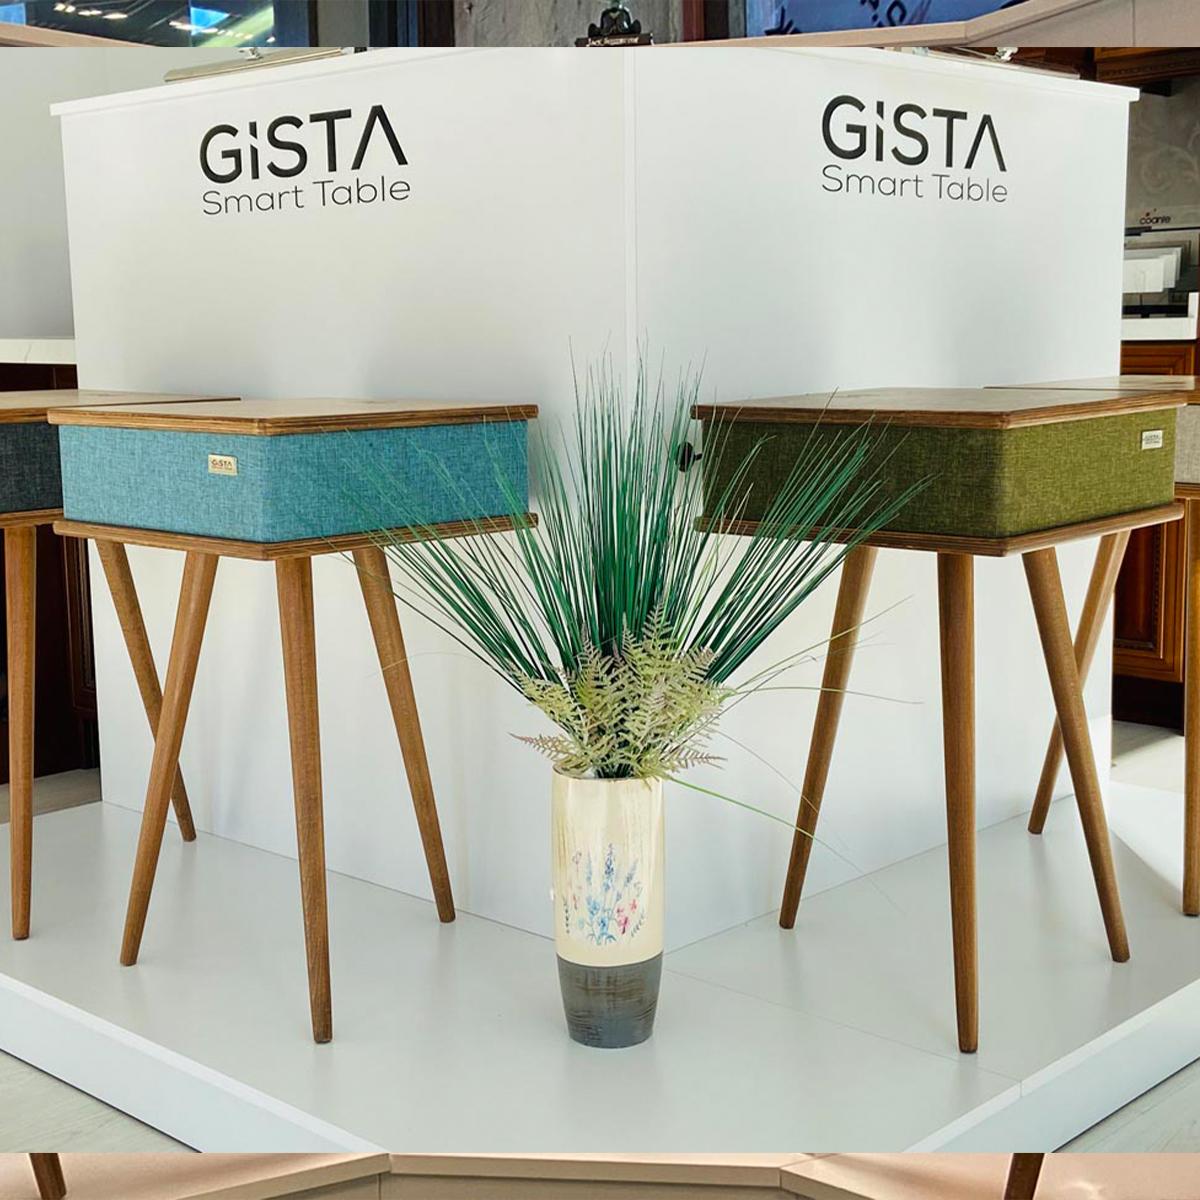 Gista-Smart-Table-Akıllı-Sehpa-4